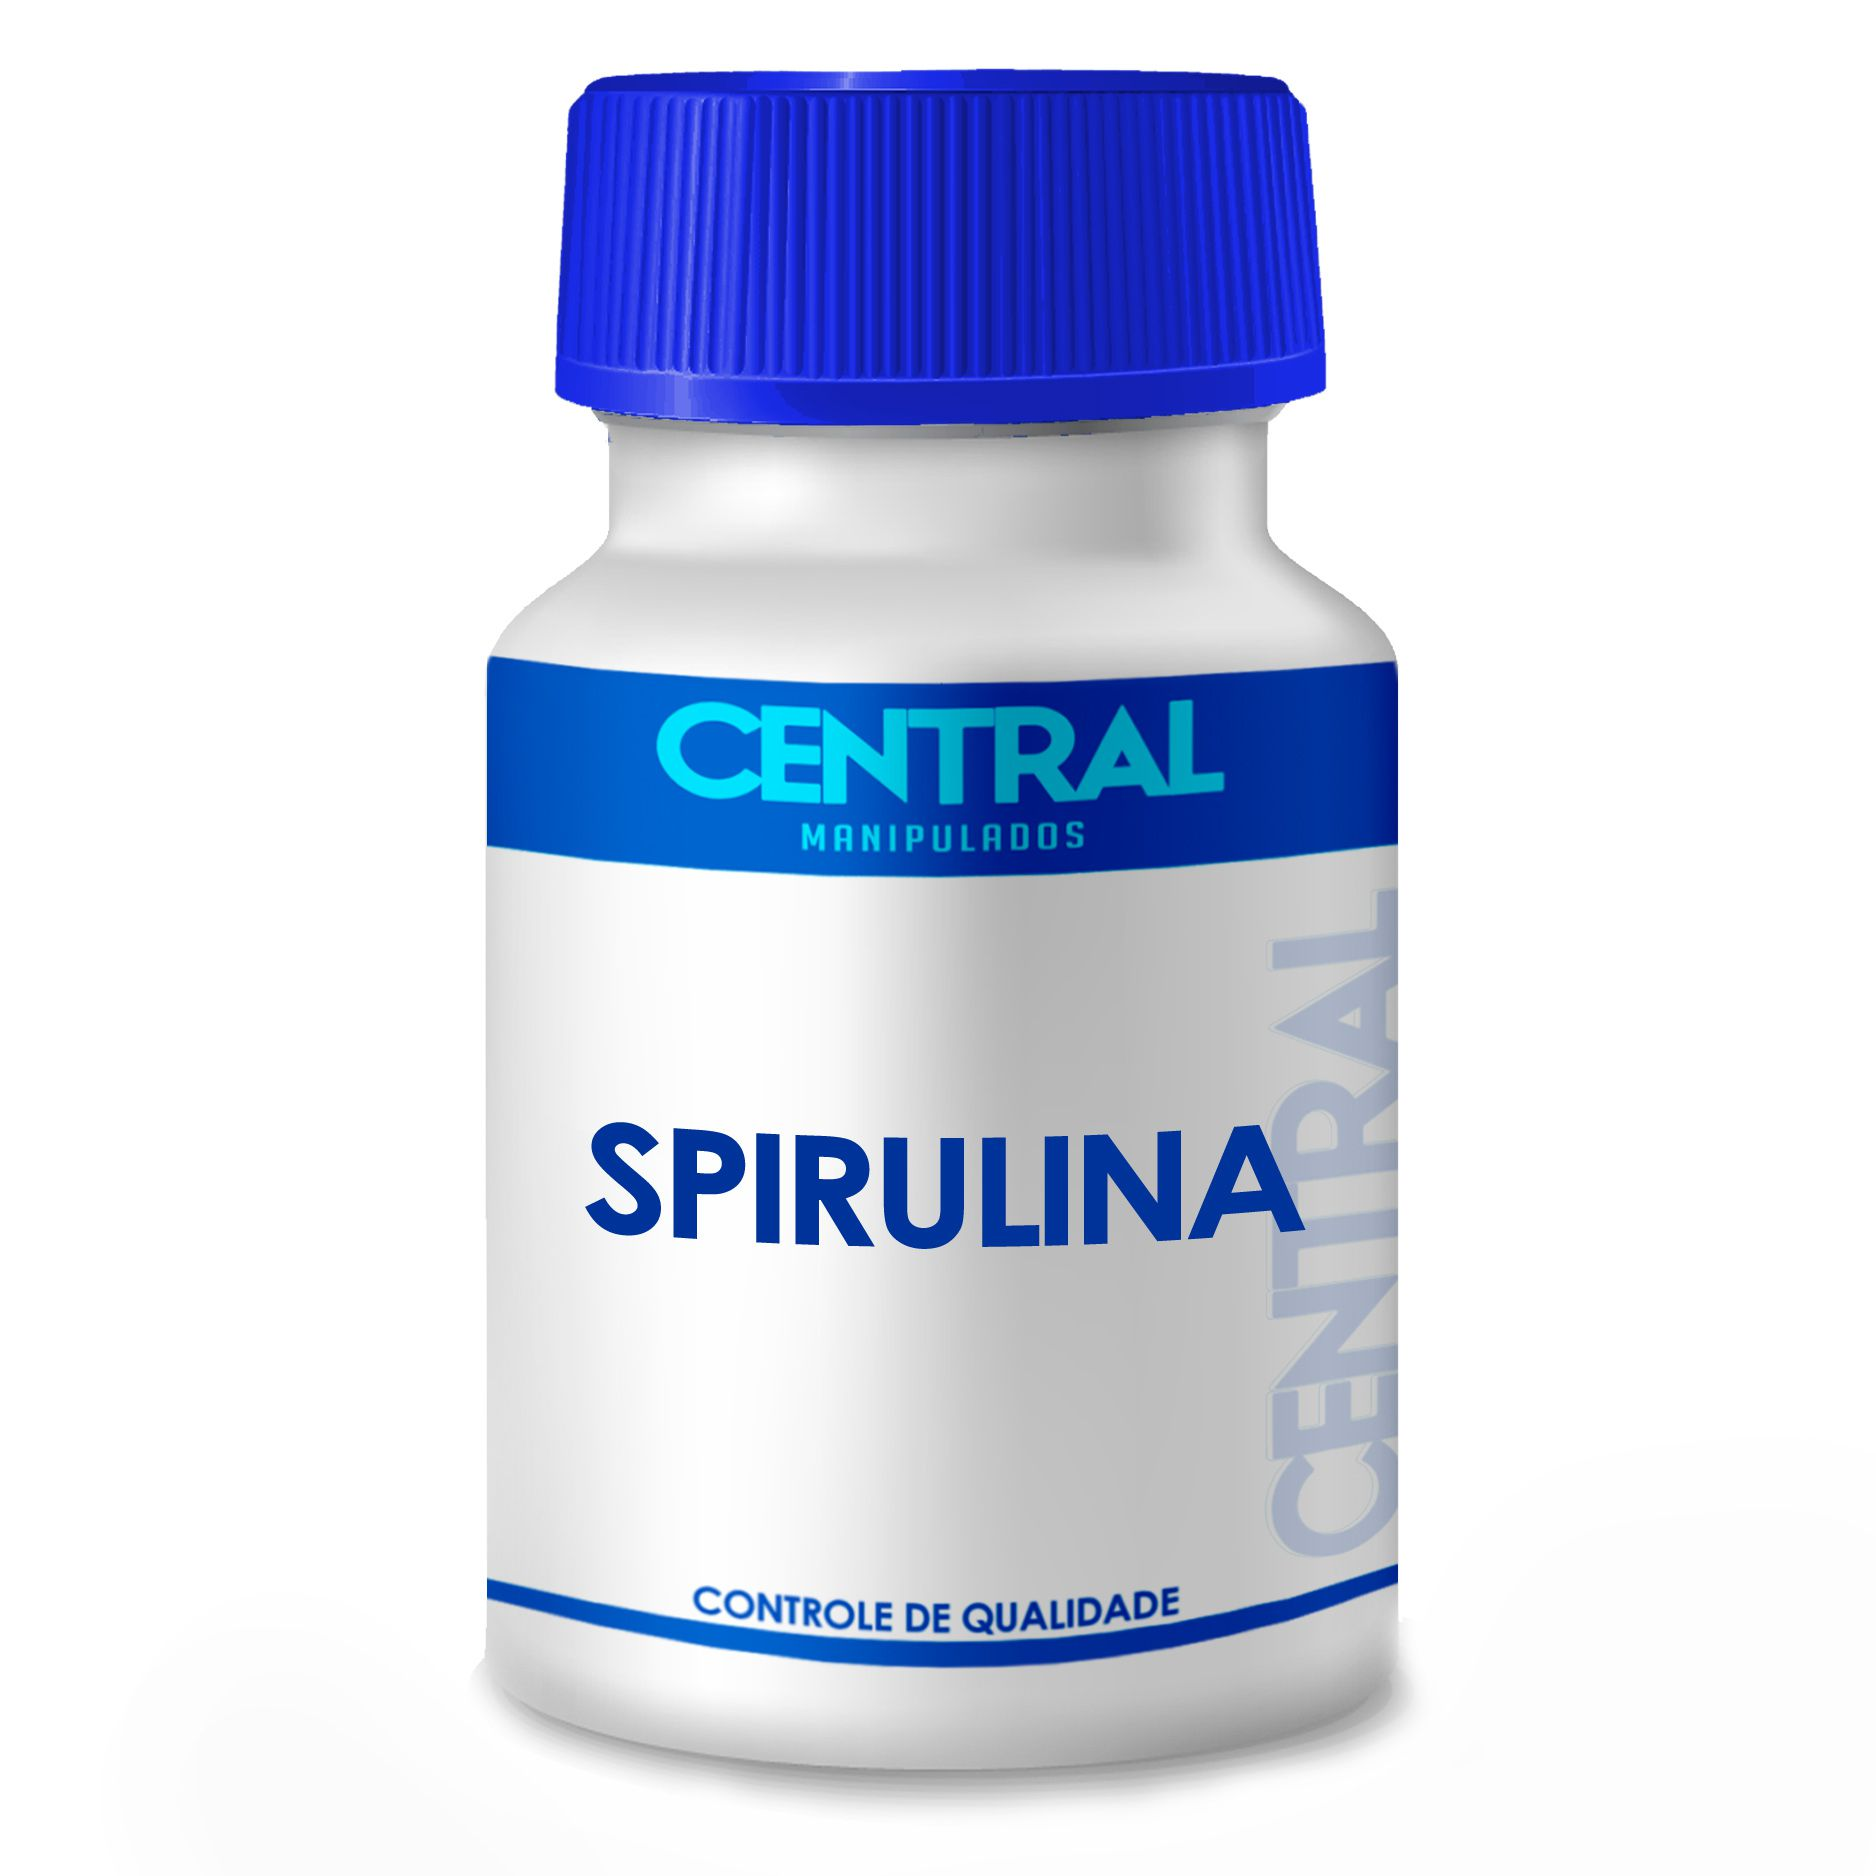 Spirulina - Inibidor de Apetite - 500mg 30 cápsulas